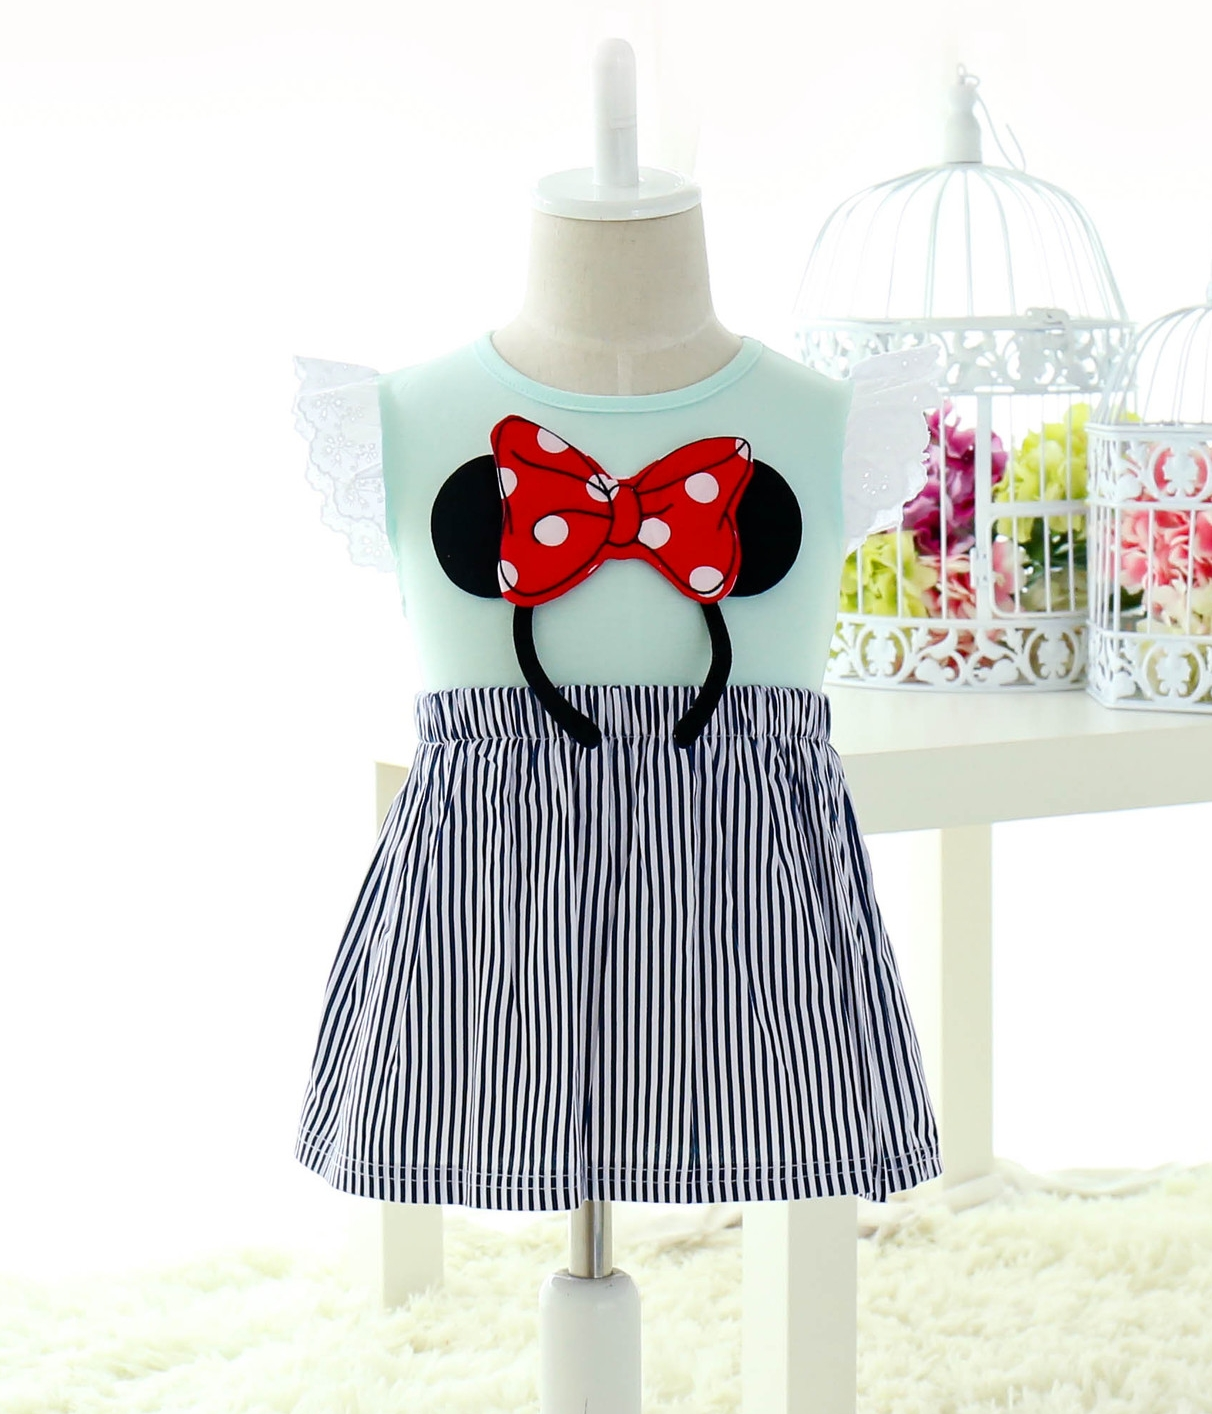 Premium kids dress import kd tosca tamochi